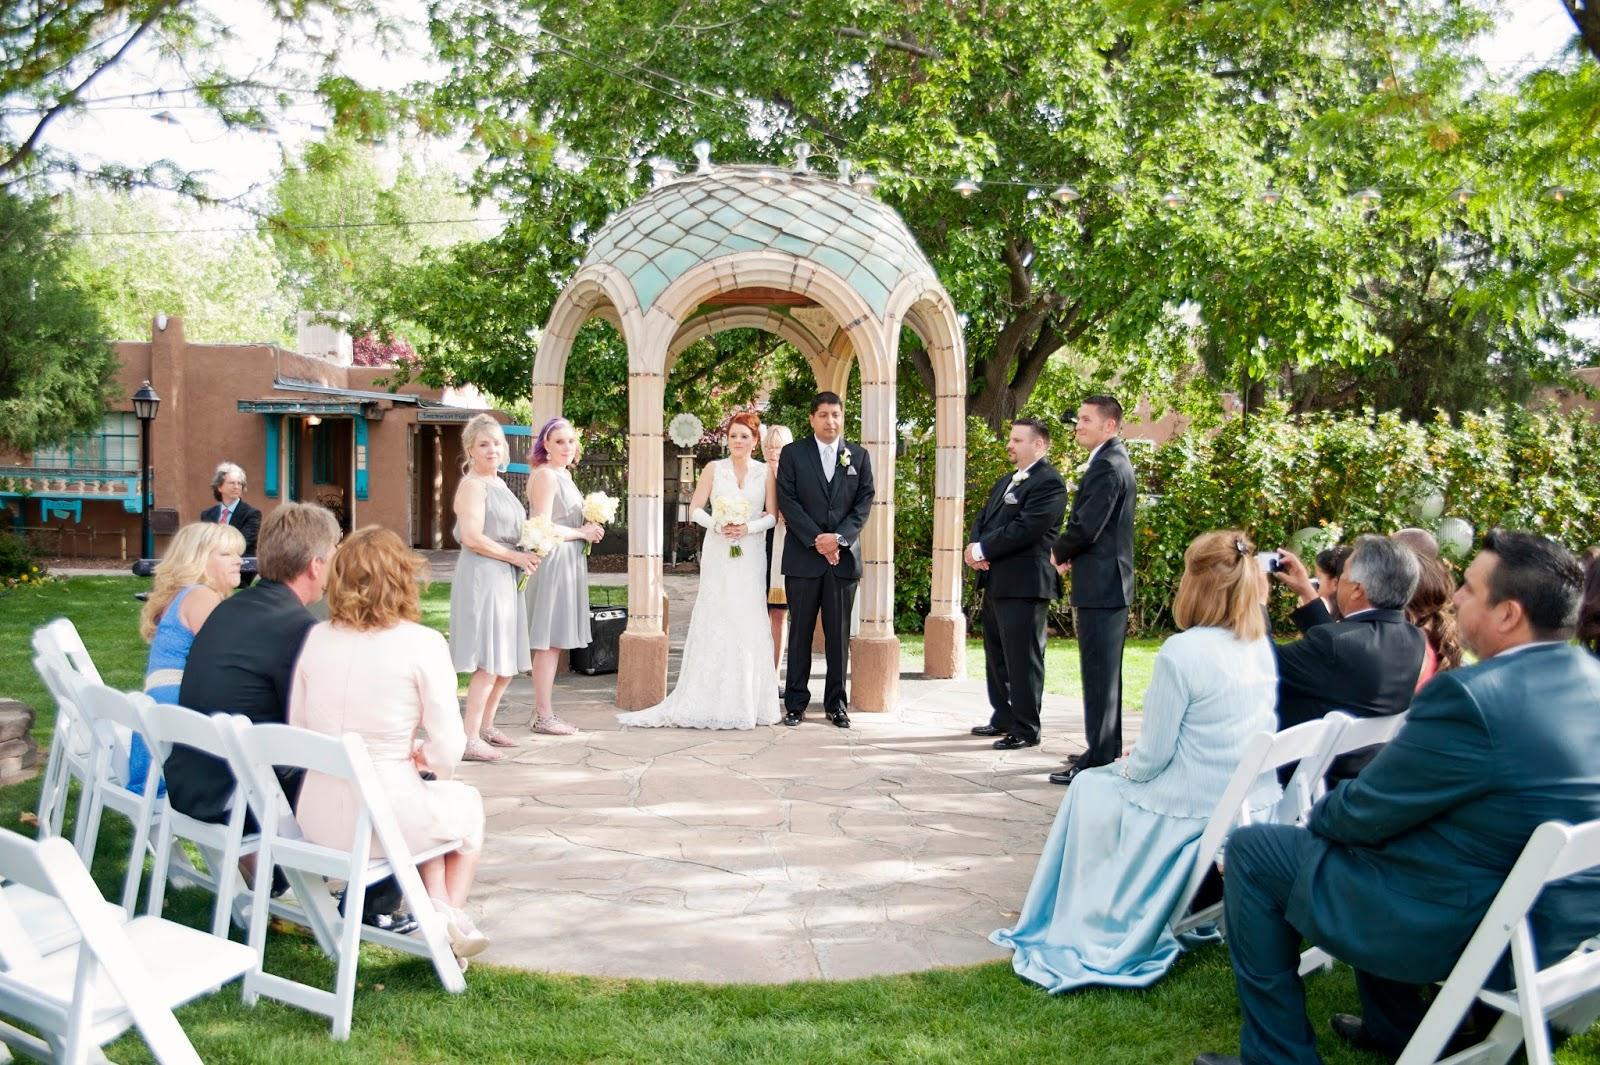 New Mexico Wedding, New mexico Wedding Photographer, Albuquerque Wedding Photography, Albuquerque Wedding Photographer, Casa De Suenos Wedding, Casa de Suenos, Casa De Suenos Albuquerque